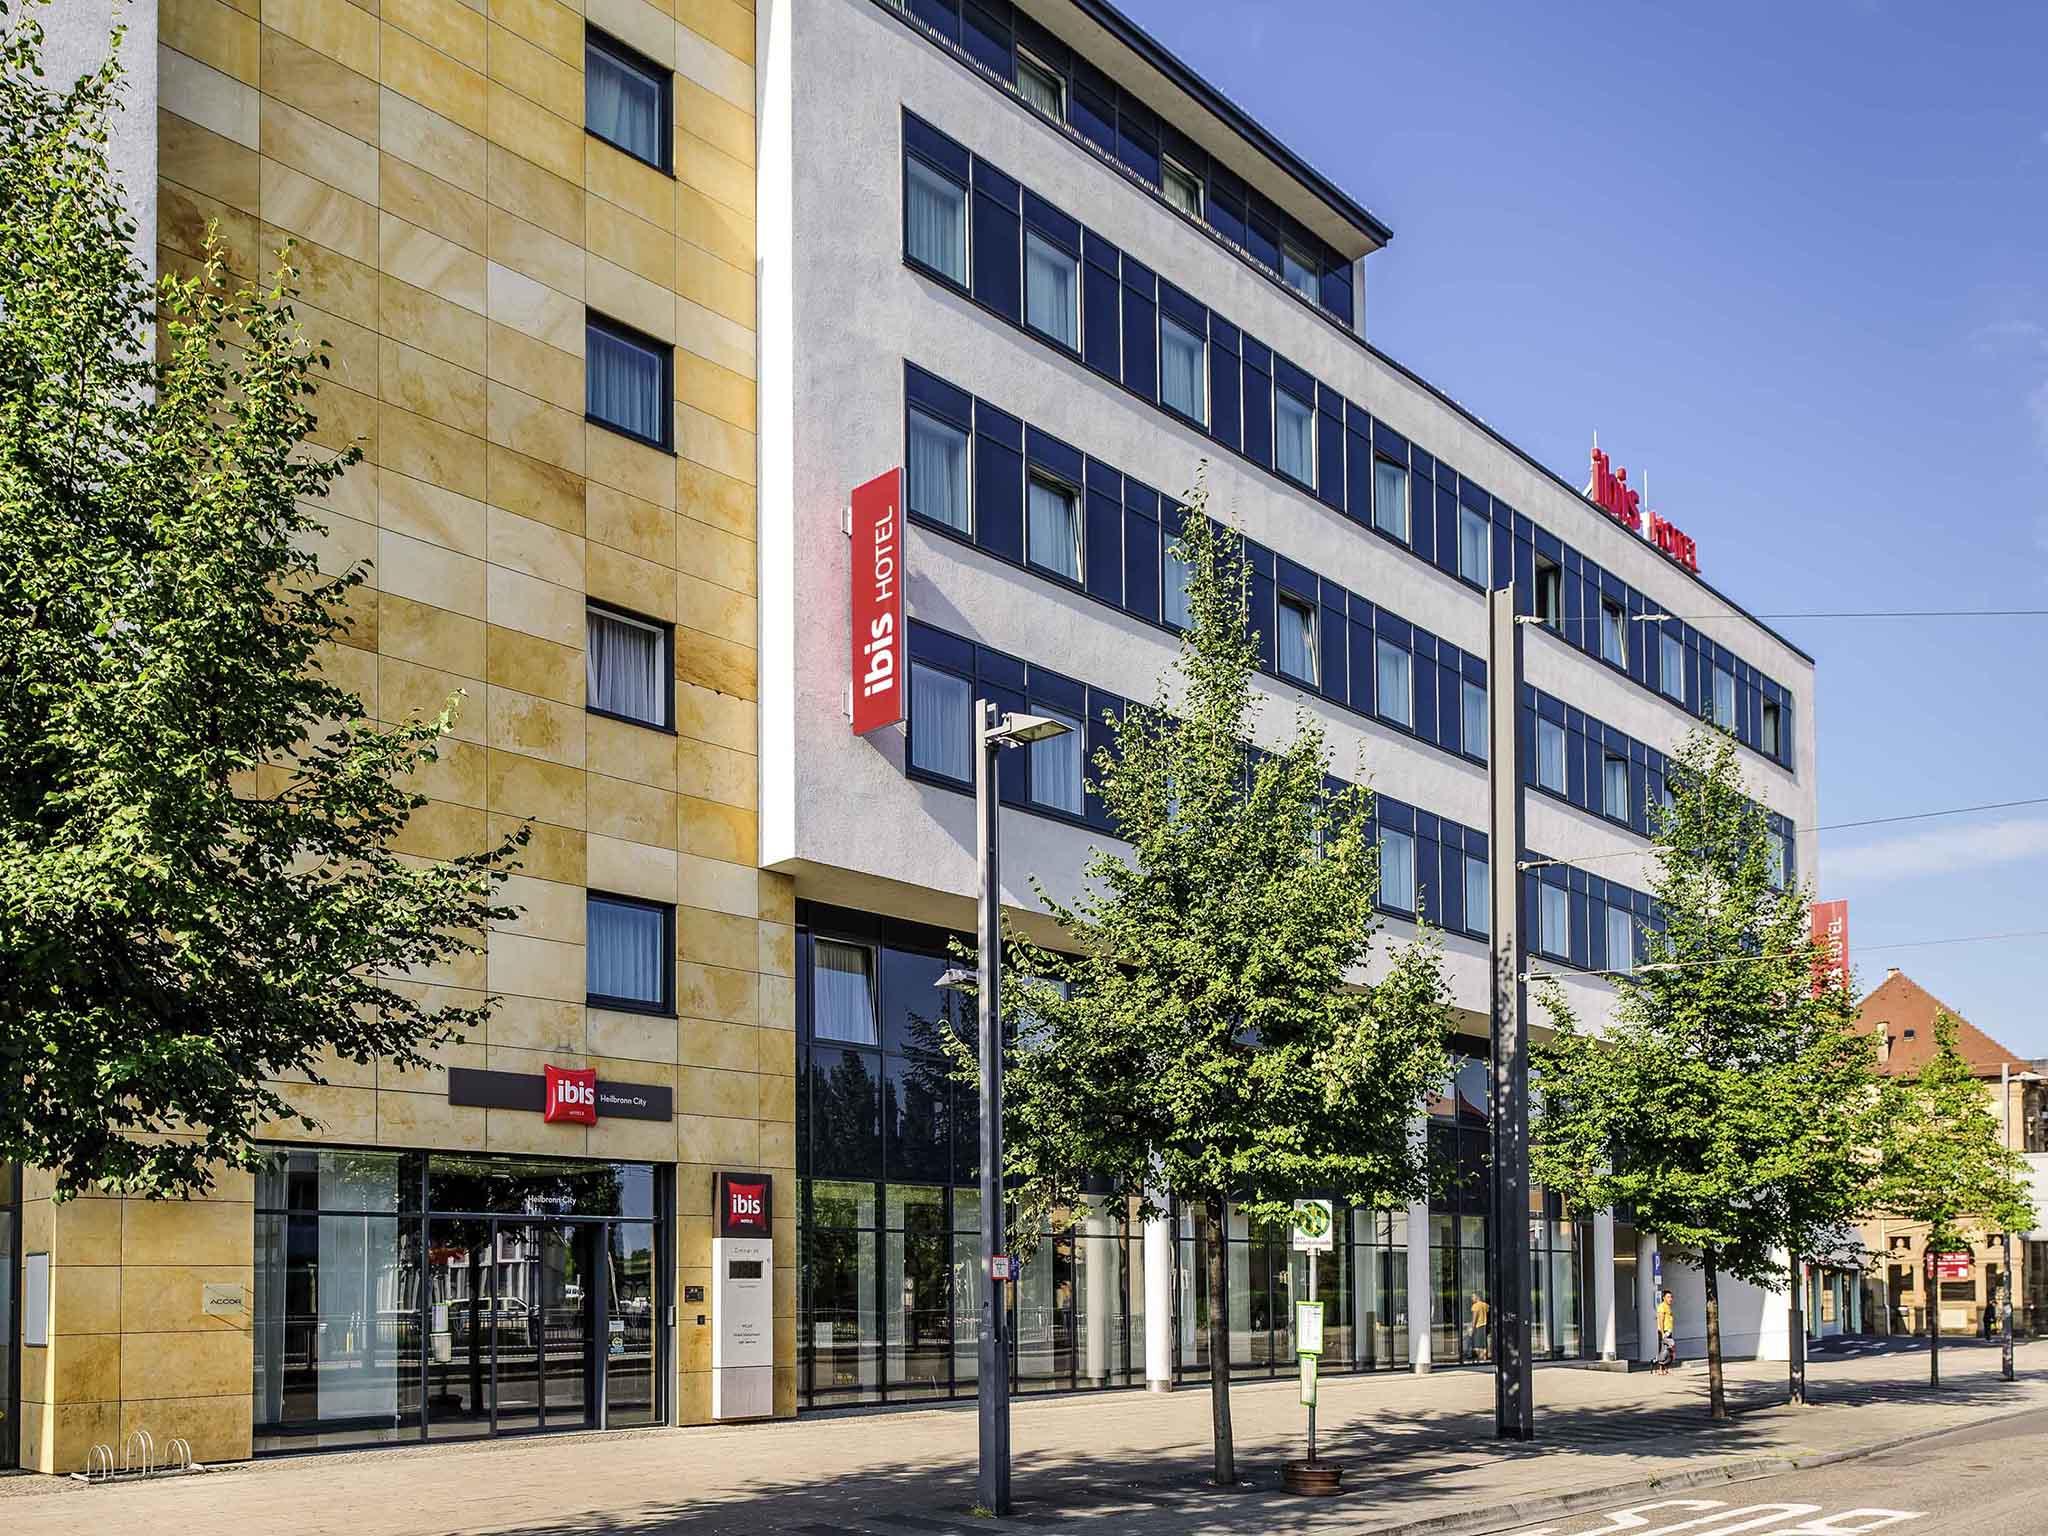 Ibis Hotel Aachen City